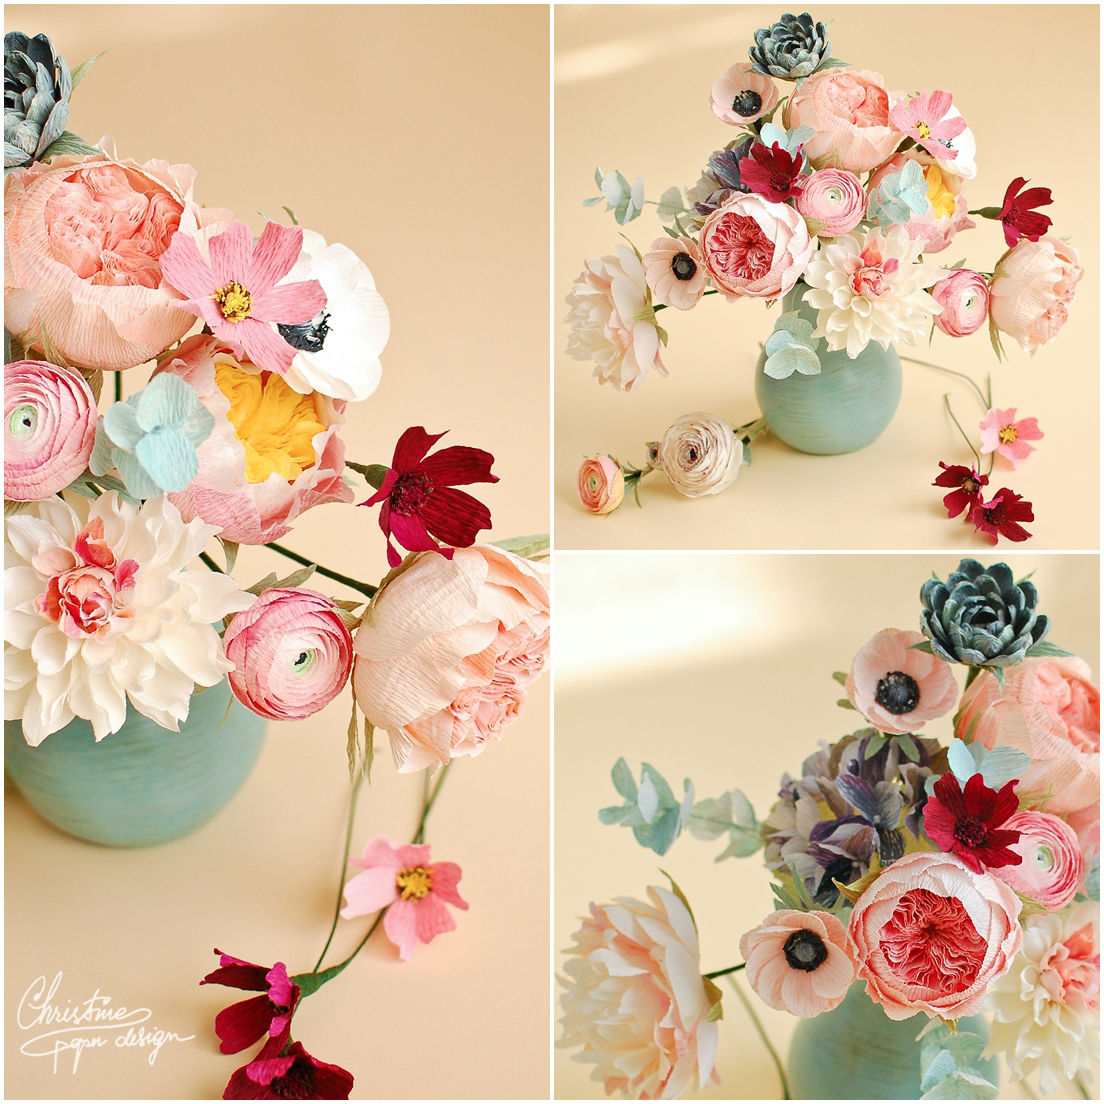 4'Christine paper design - paper roses2